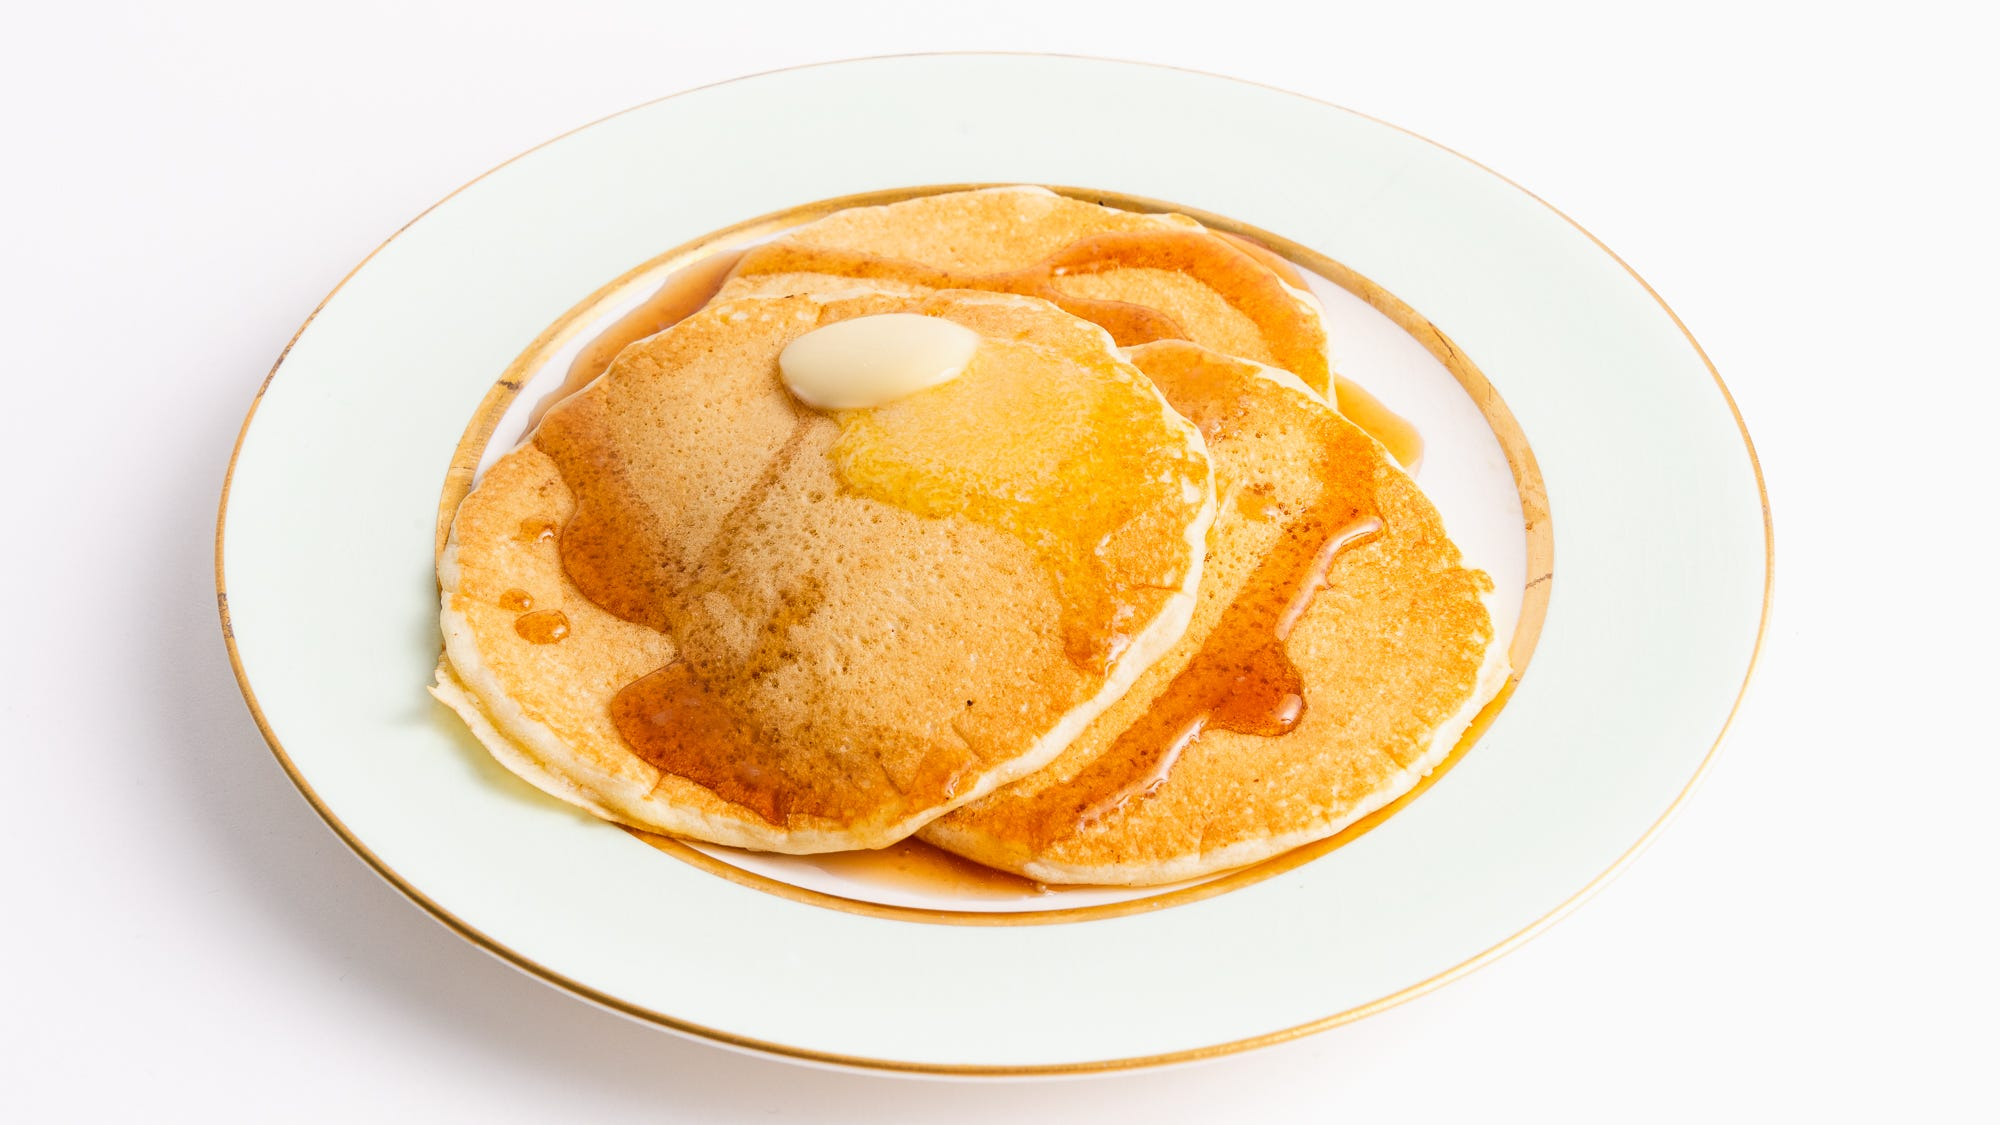 Tuesday Recipe Diner Style Sourdough Discard Pancakes